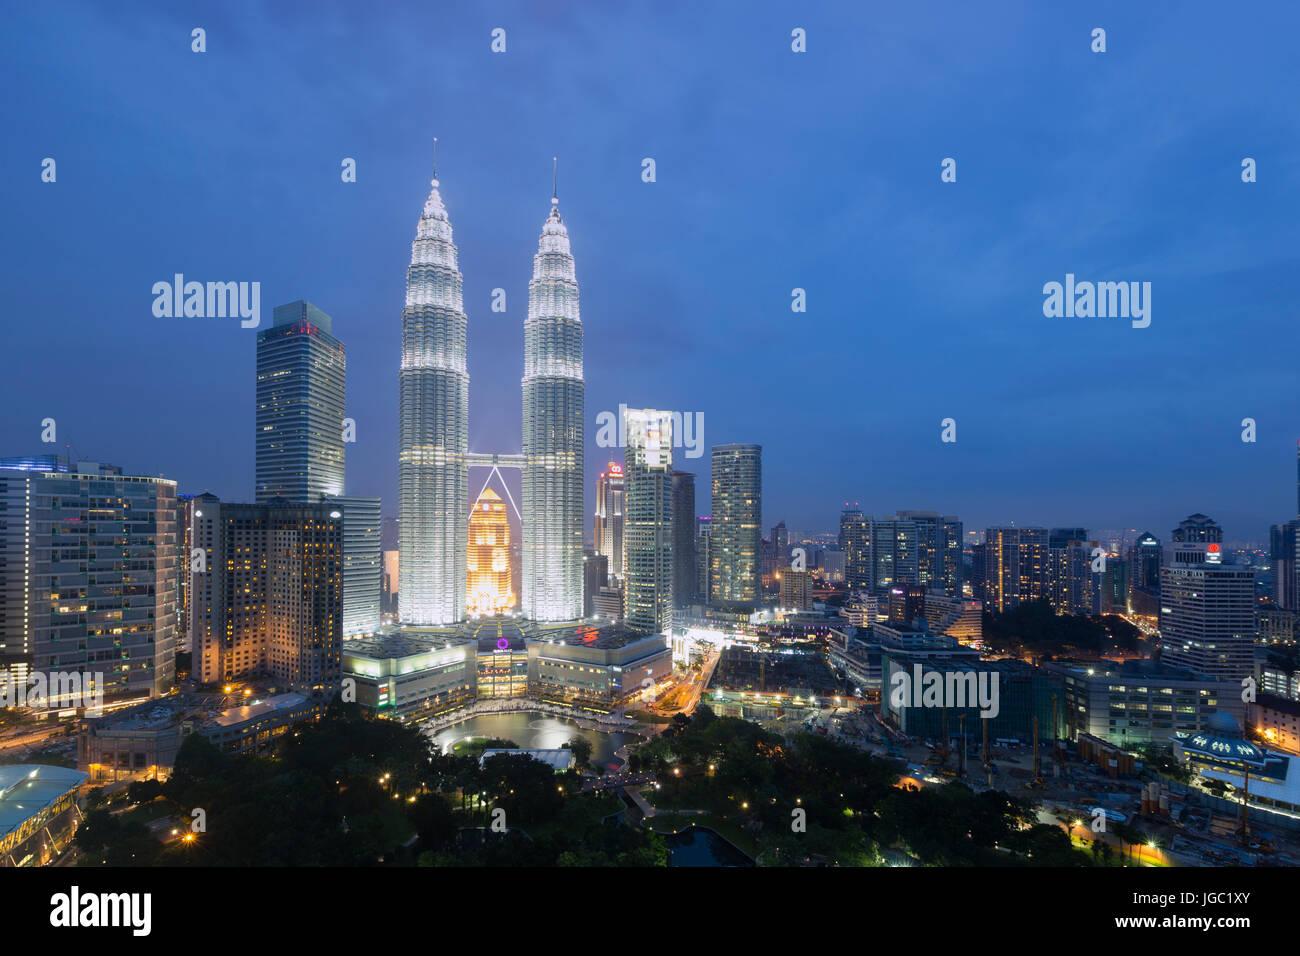 Al anochecer, las torres Petronas de Kuala Lumpur, Malasia Imagen De Stock